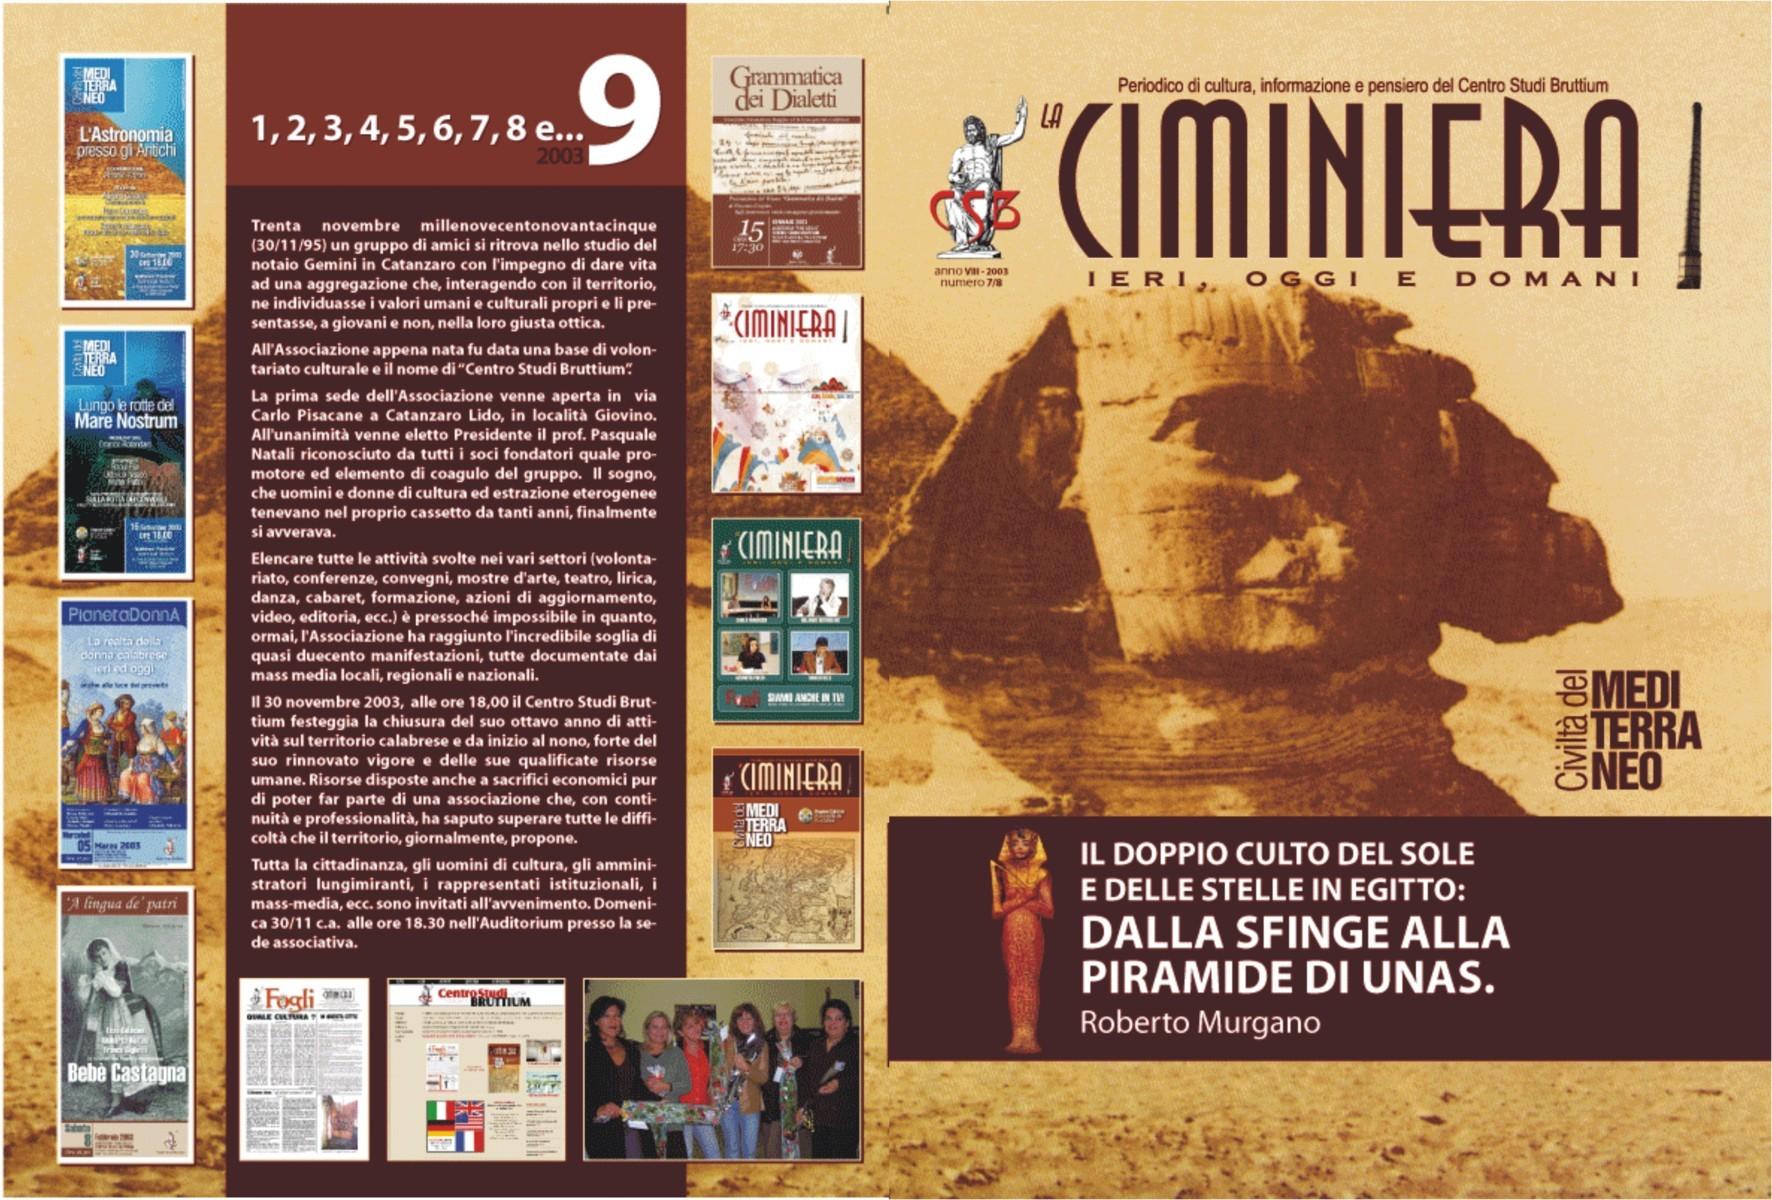 2003 LaCiminiera VIII - 07_08